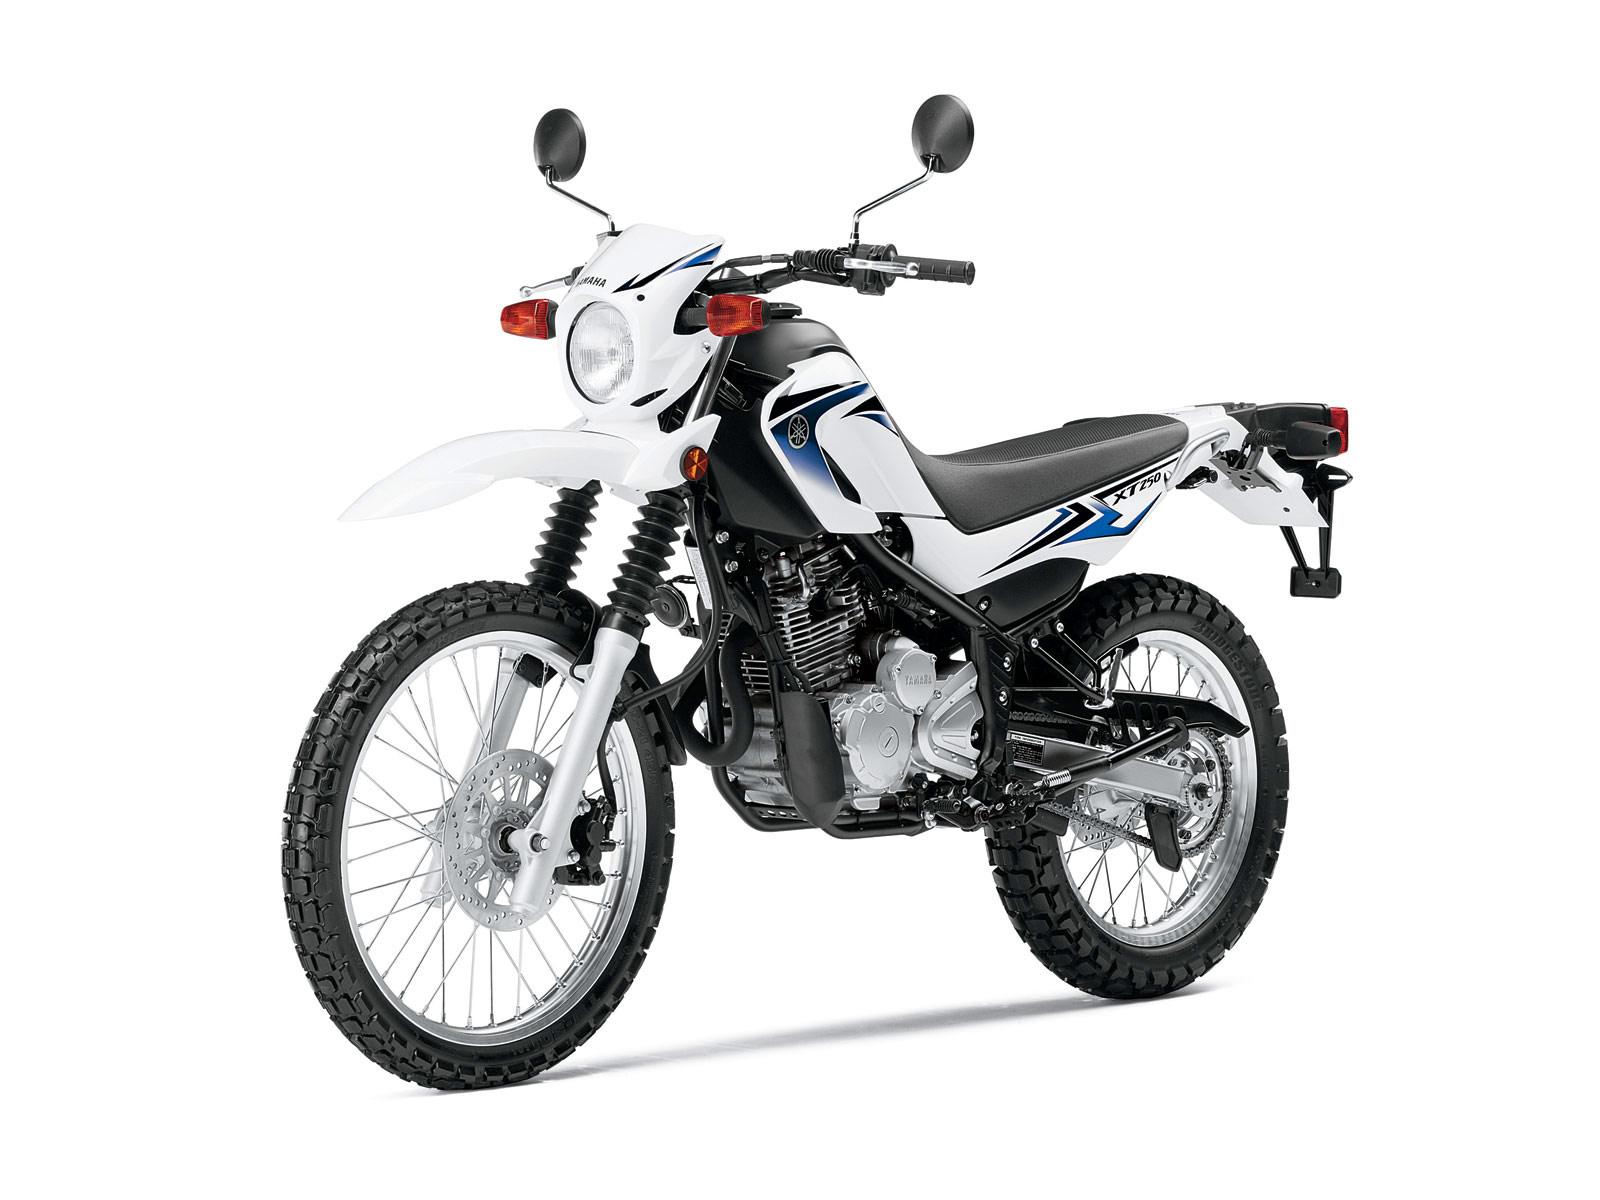 Yamaha Motorcycle Prototypes